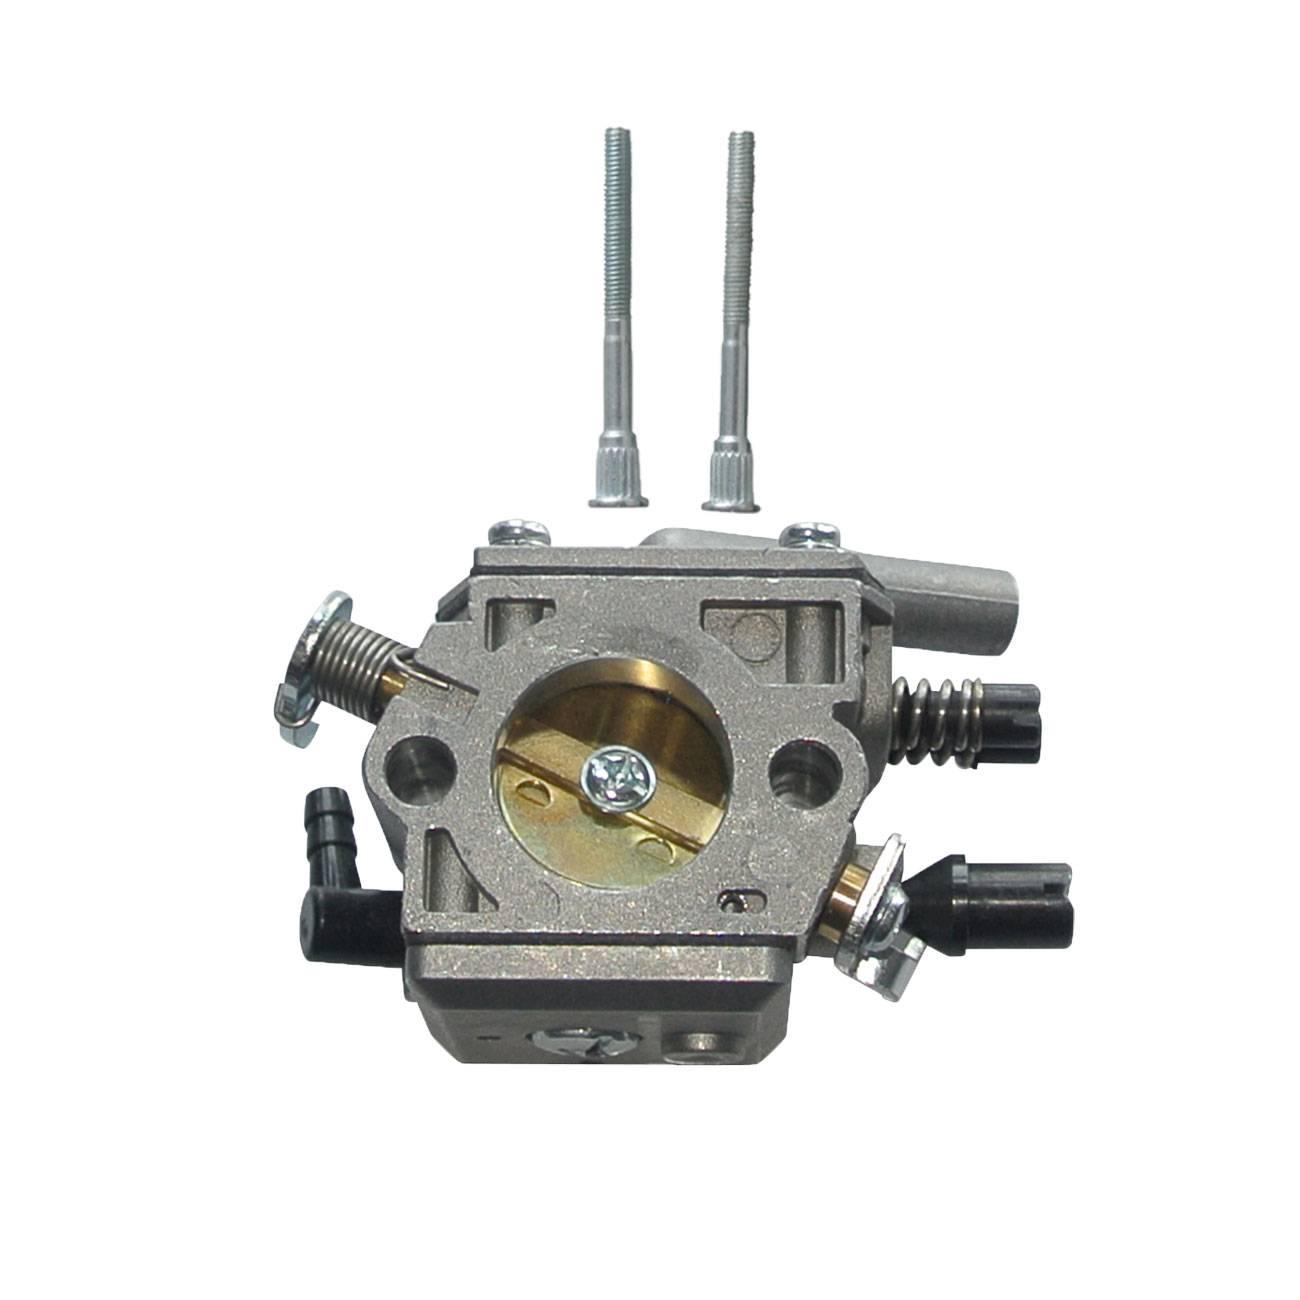 Carburetor For Stihl 038 MS380 MS381 038 AV SUPER MAGNUM Chainsaw Carb